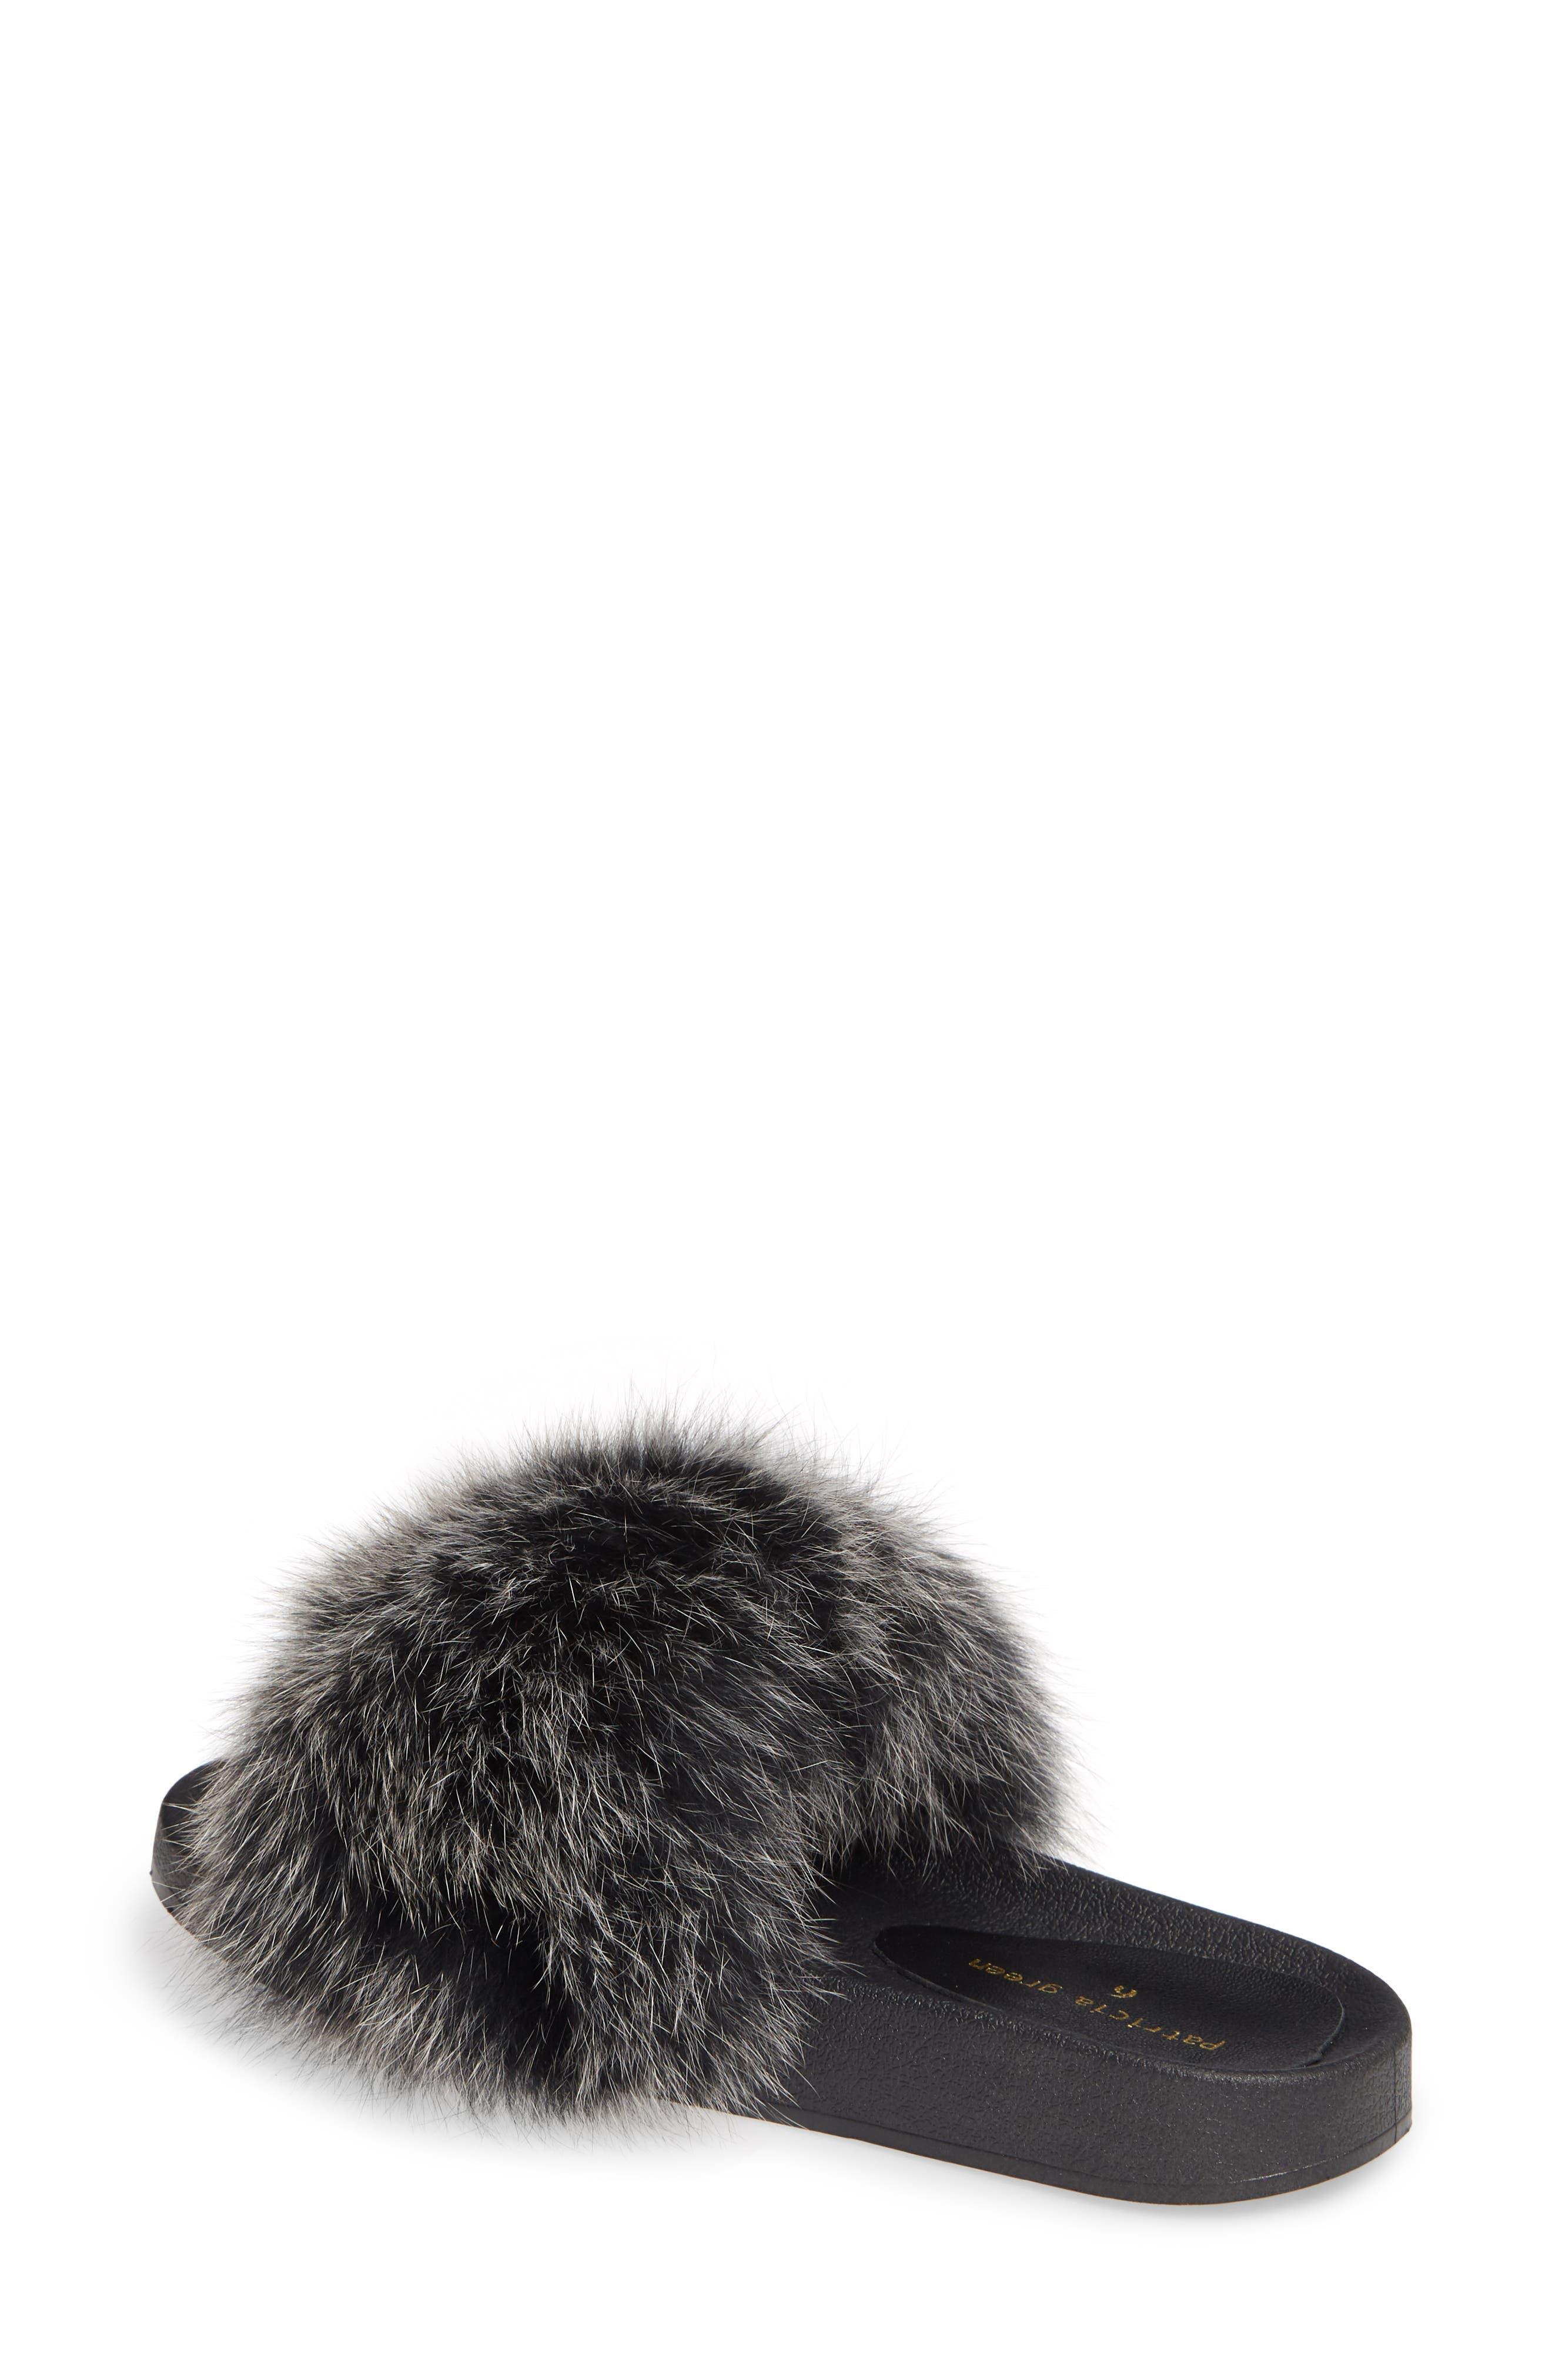 PATRICIA GREEN, Foxy Genuine Fox Fur Slipper, Alternate thumbnail 2, color, BLACK/ WHITE FUR